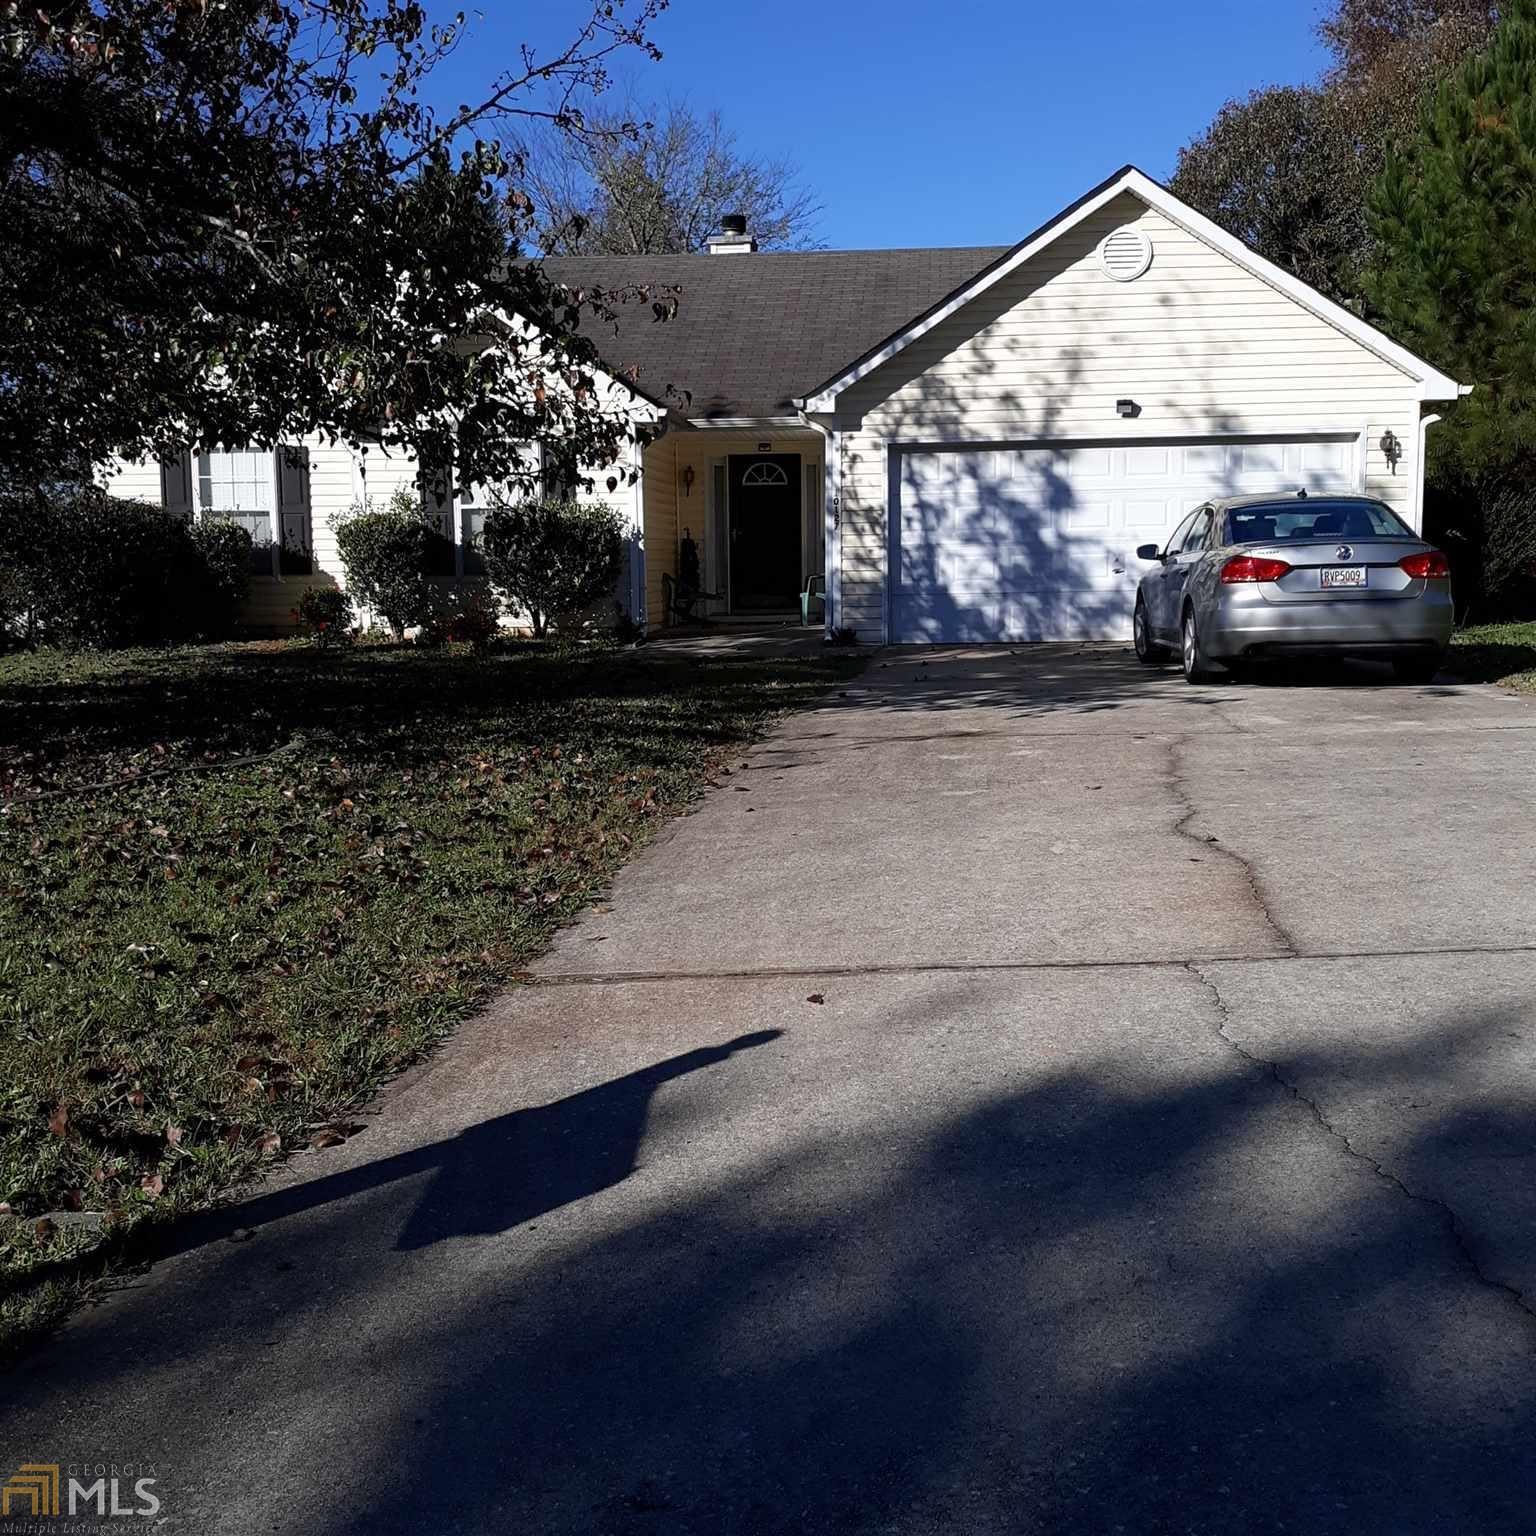 10127 Commons Way, Jonesboro, GA 30238 - MLS#: 8893984